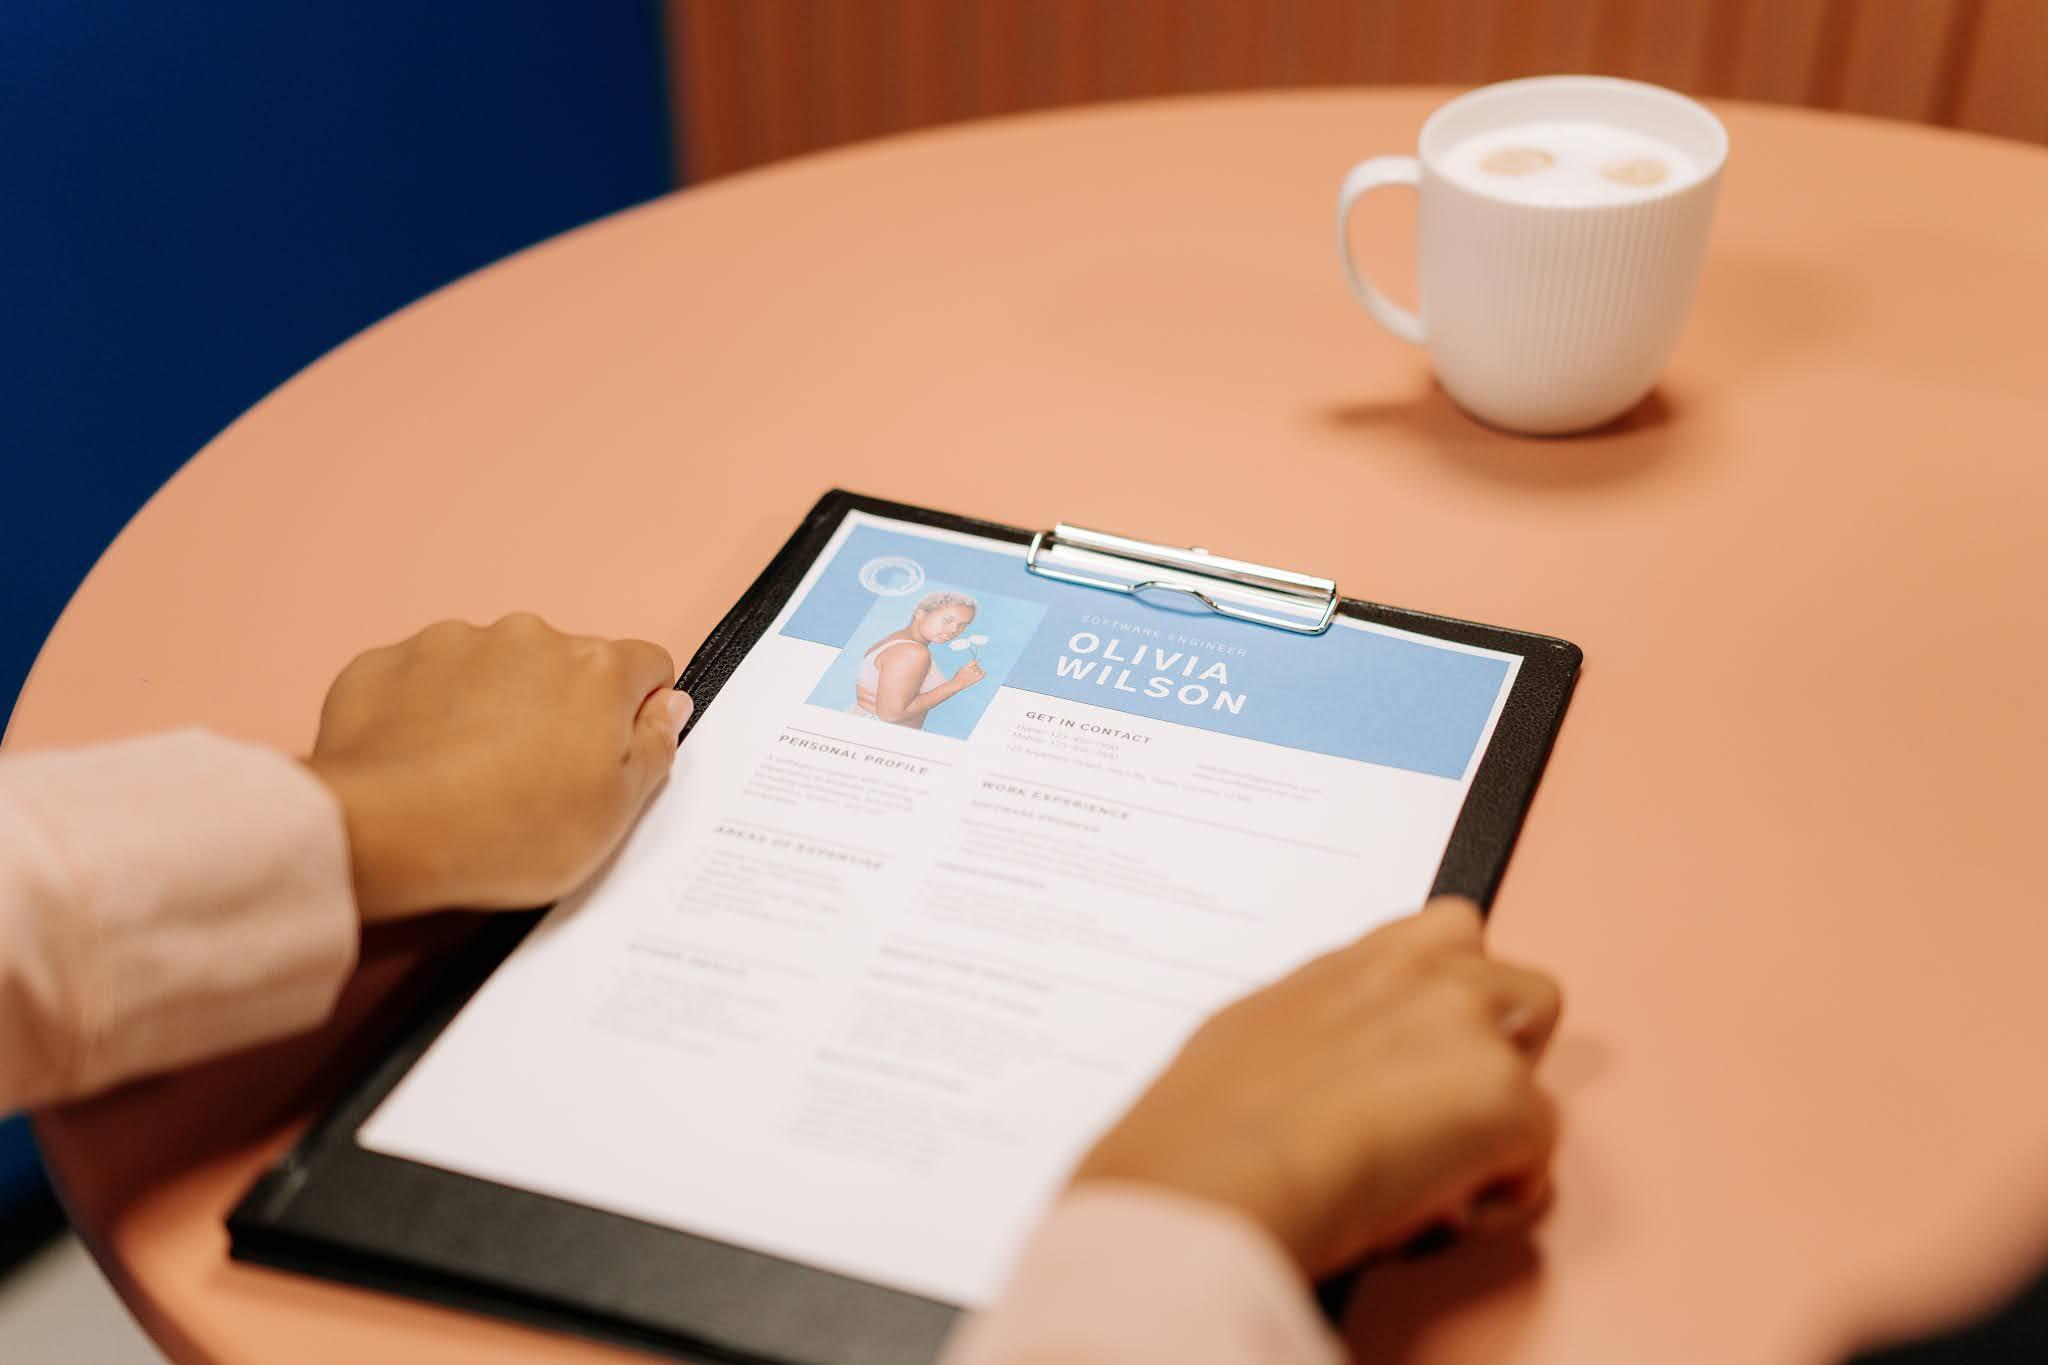 online business ideas in Bihar